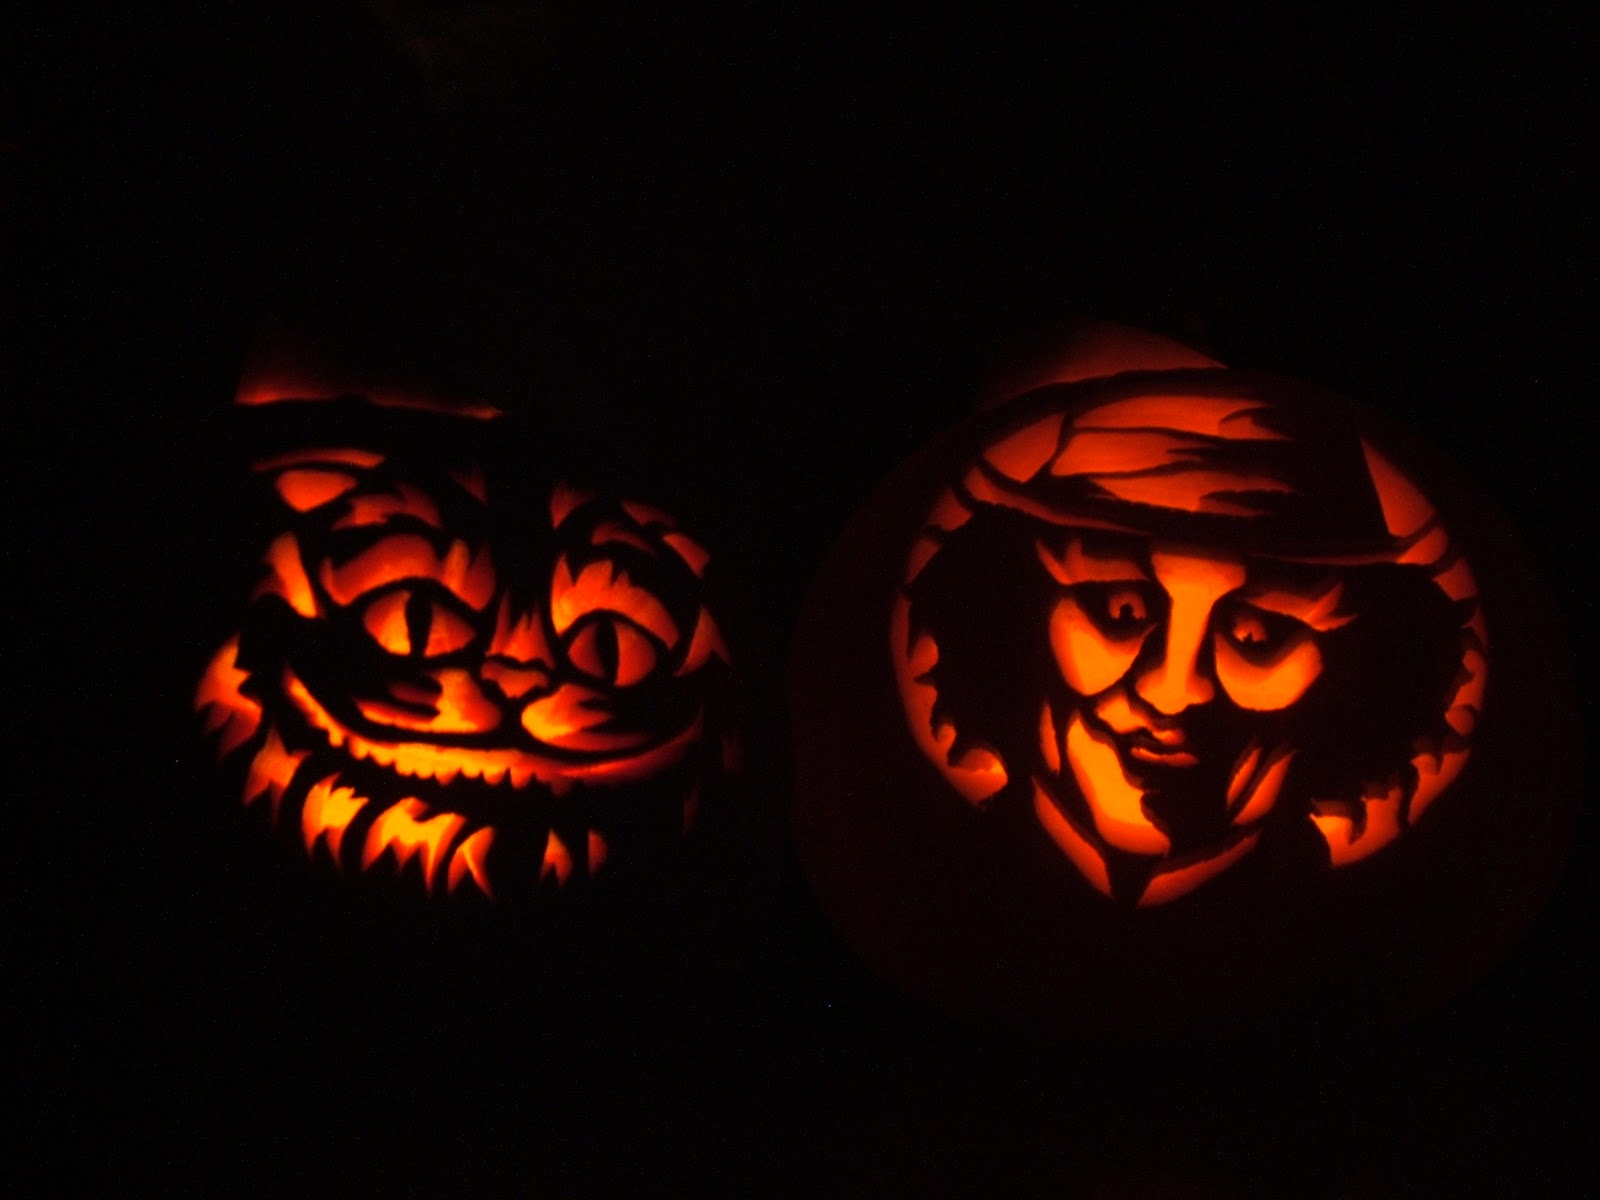 Alice in wonderland pumpkin carving patterns imgkid